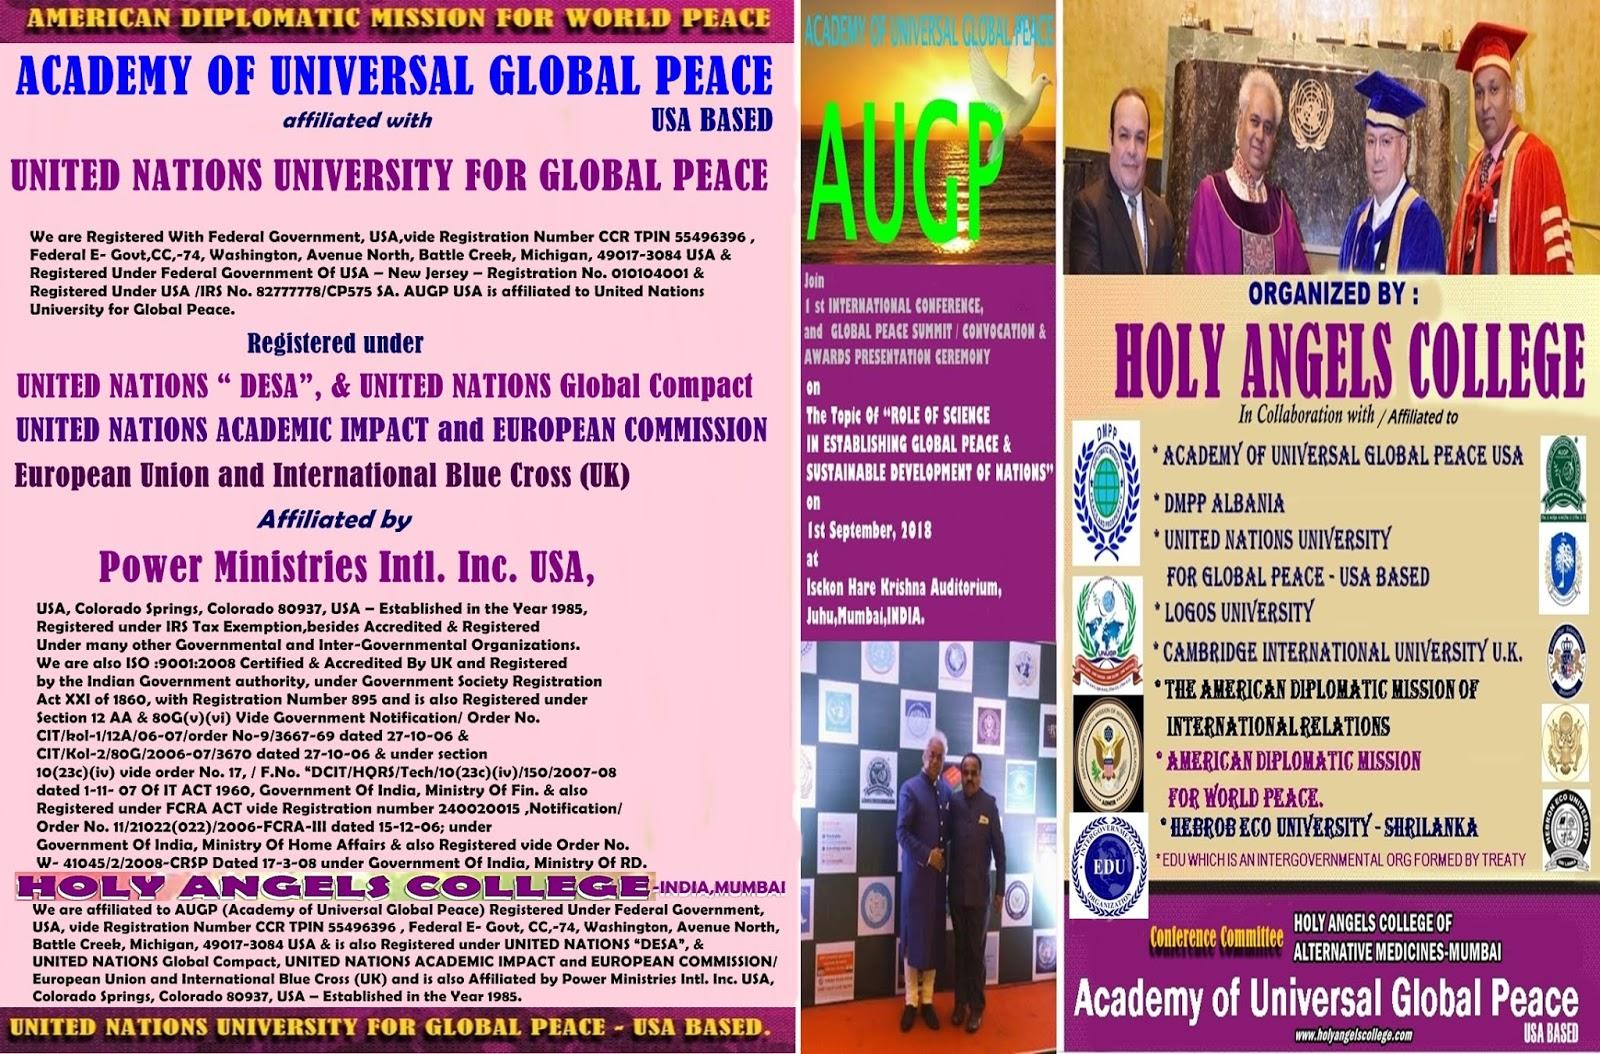 HOLY ANGELS COLLEGE MUMBAI MAHARASTRA